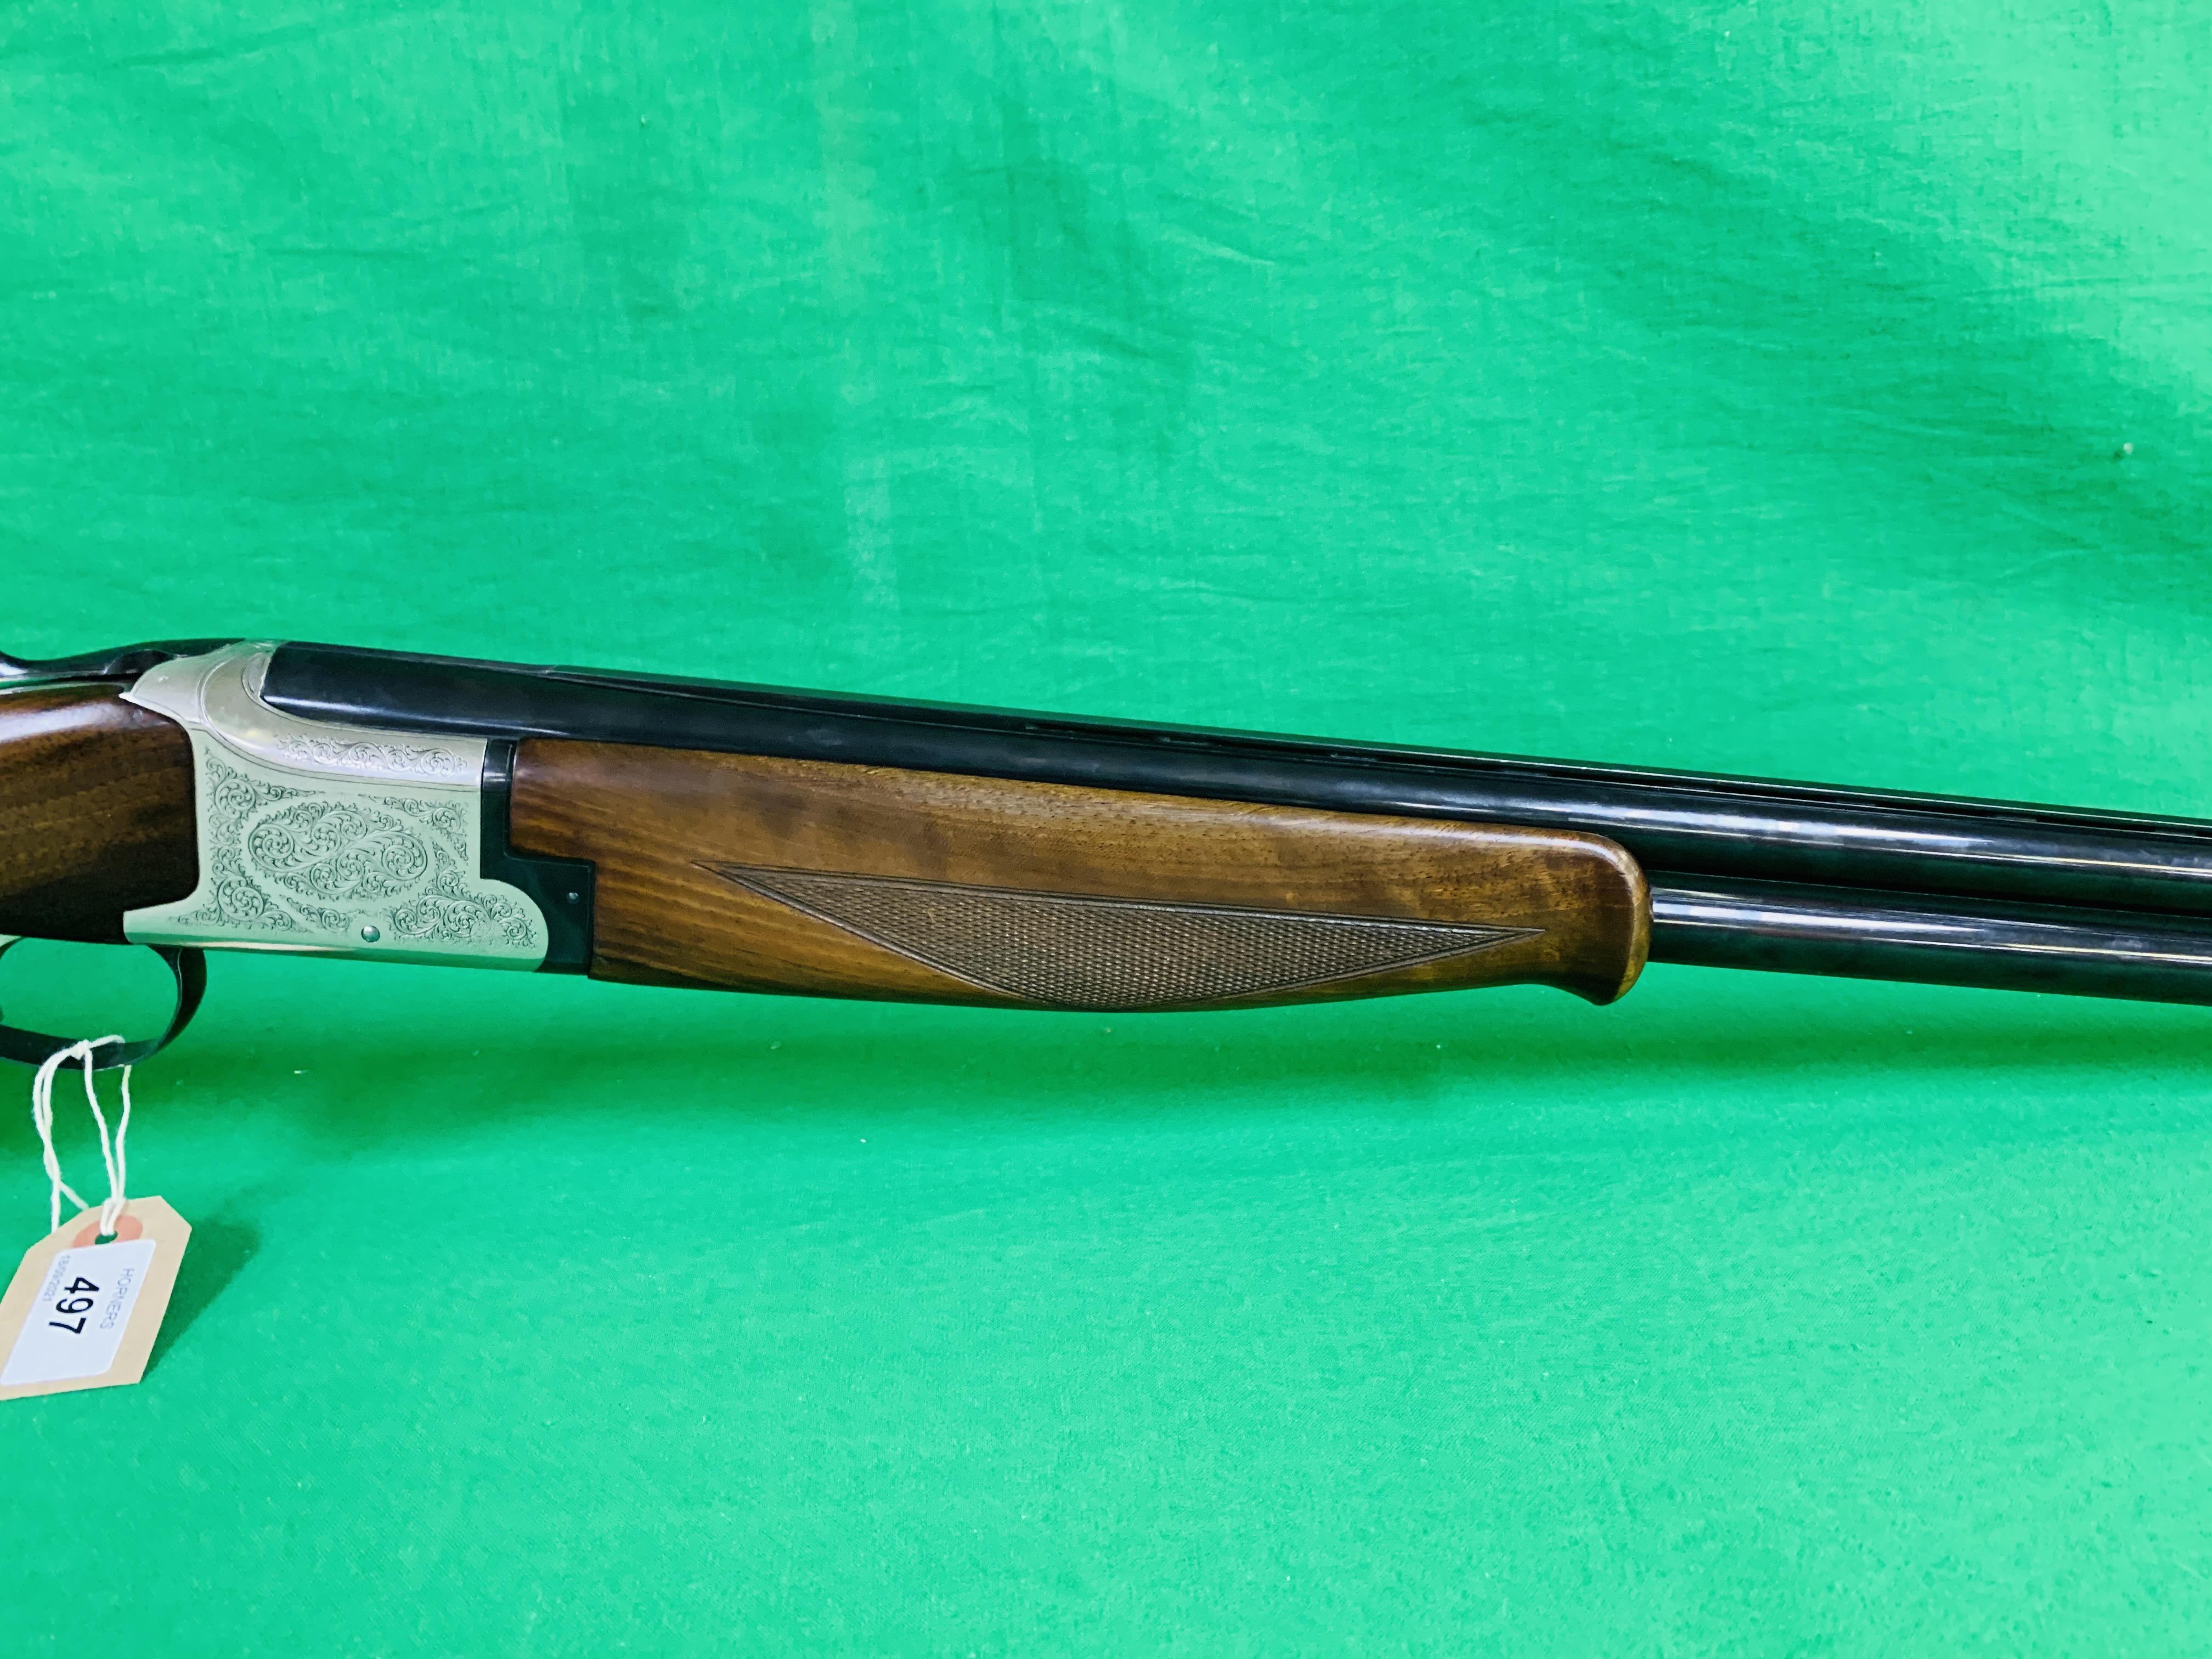 WINCHESTER MODEL 91 12 BORE OVER AND UNDER SHOTGUN # 232623 28 INCH BARRELS, - Image 5 of 8